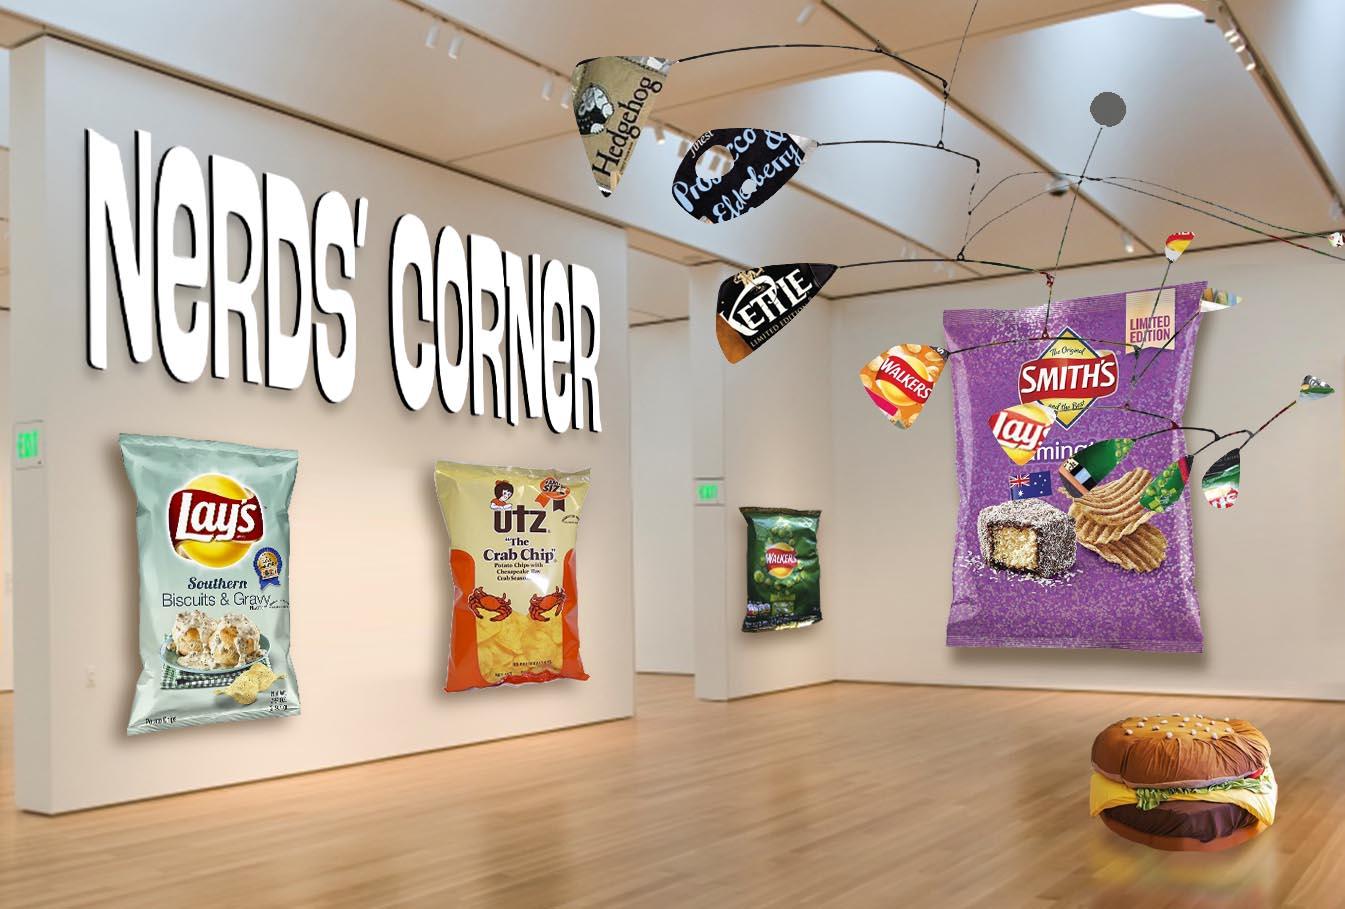 Nerds' Corner